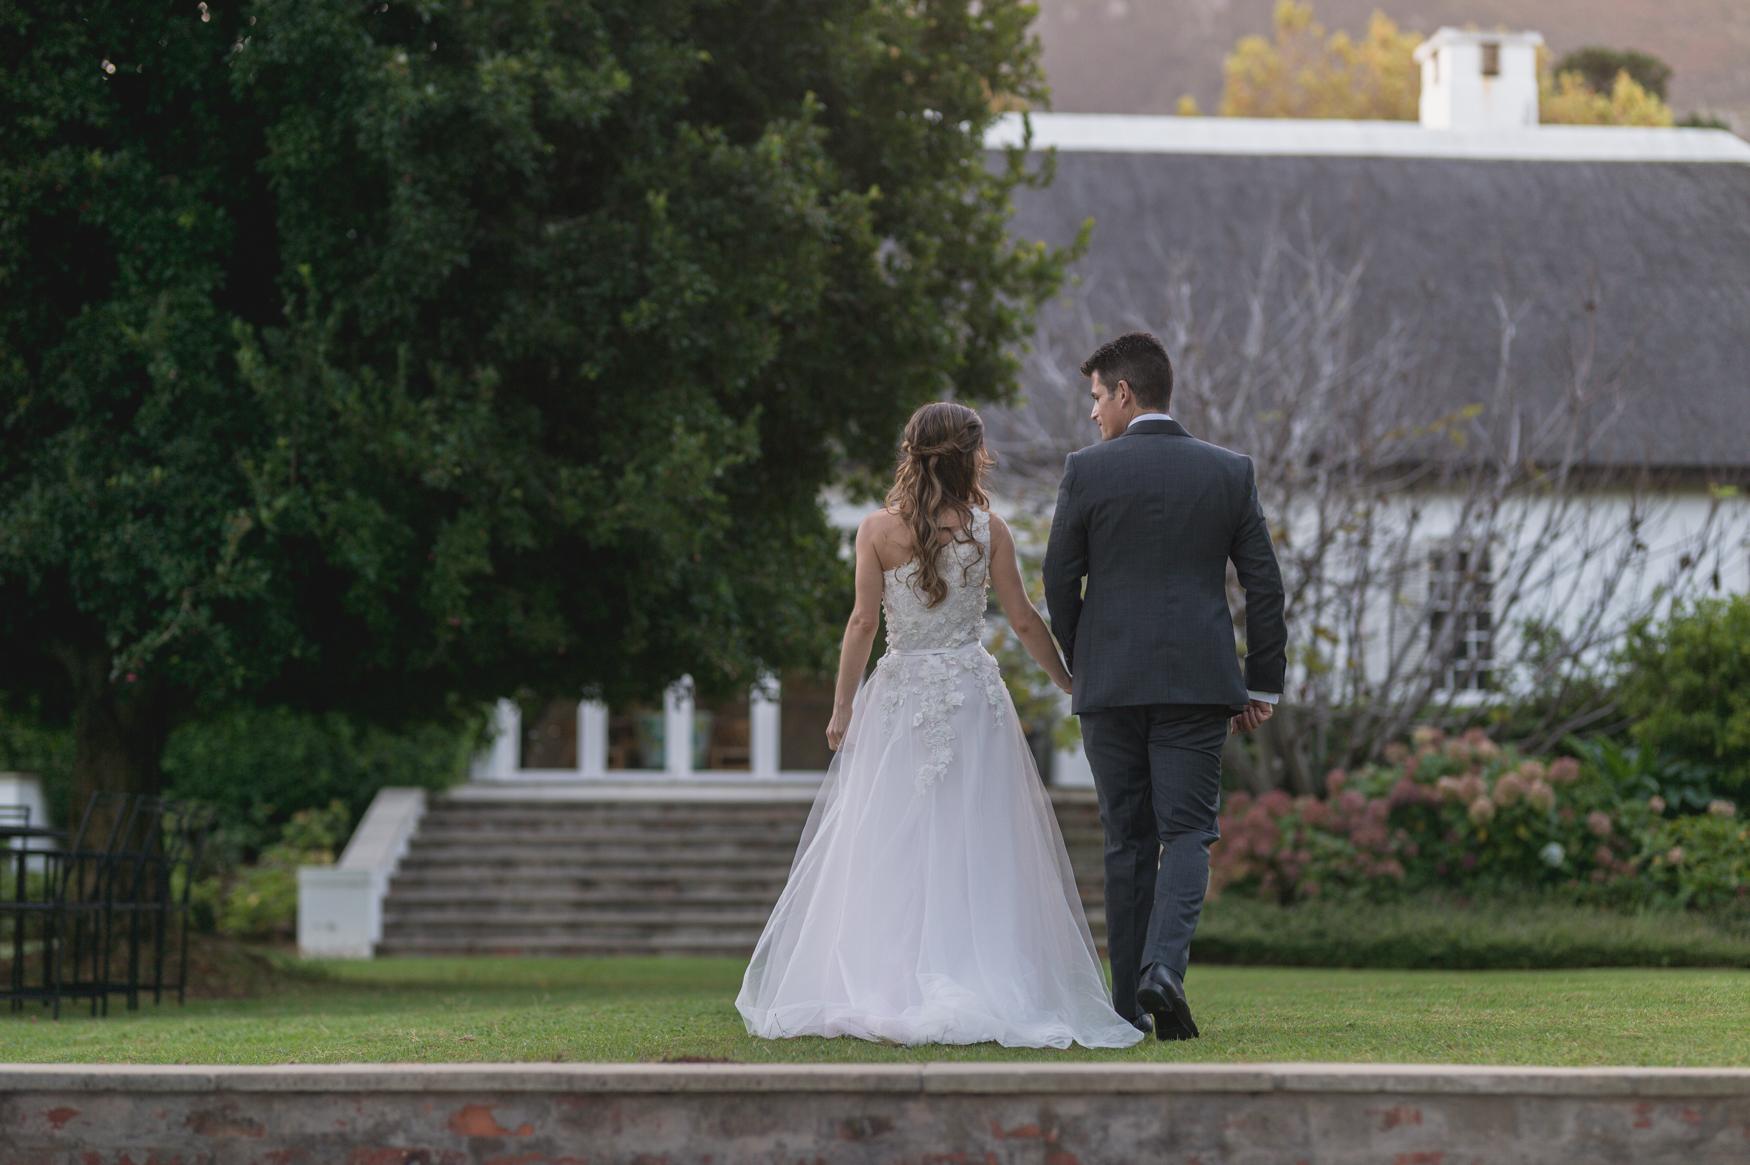 Leon_&_Martine's_Wedding_Photographs_17th_April_2019_@johnhenryweddingphoto_Low_Resolution_Web-433.JPG